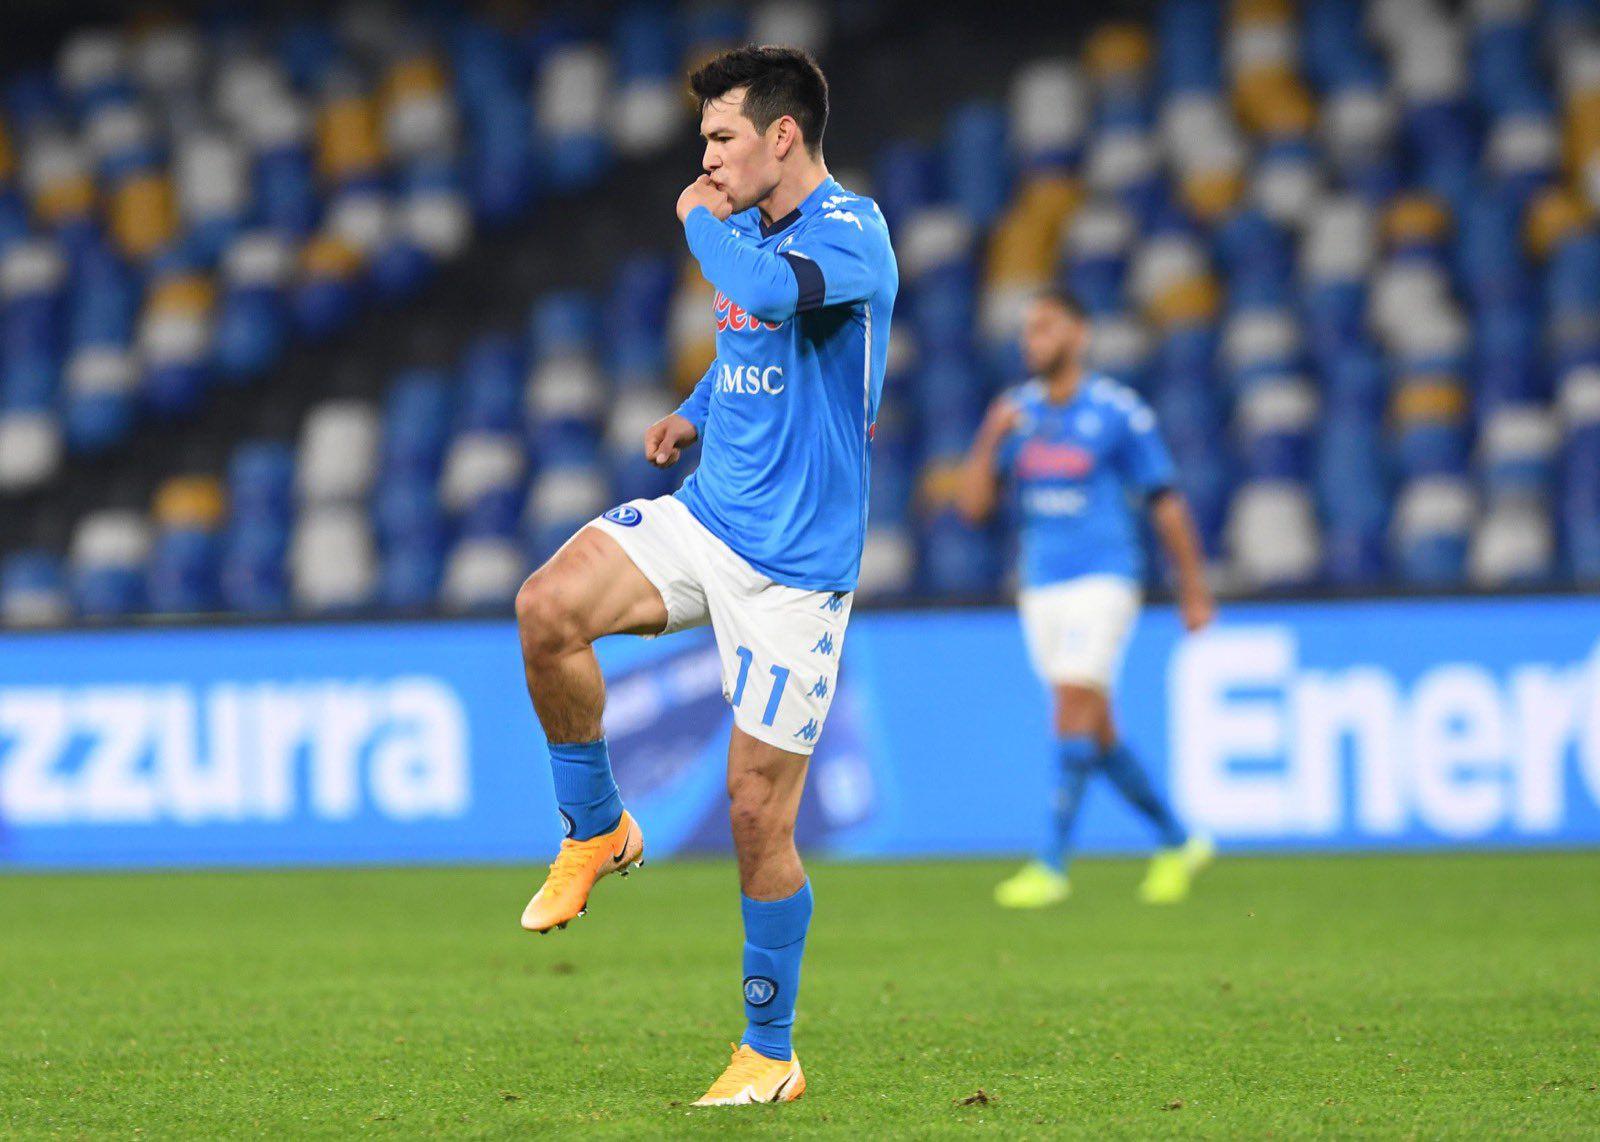 Hirving Lozano marcó el segundo gol ante Empoli (Foto: Twitter@sscnapoli)